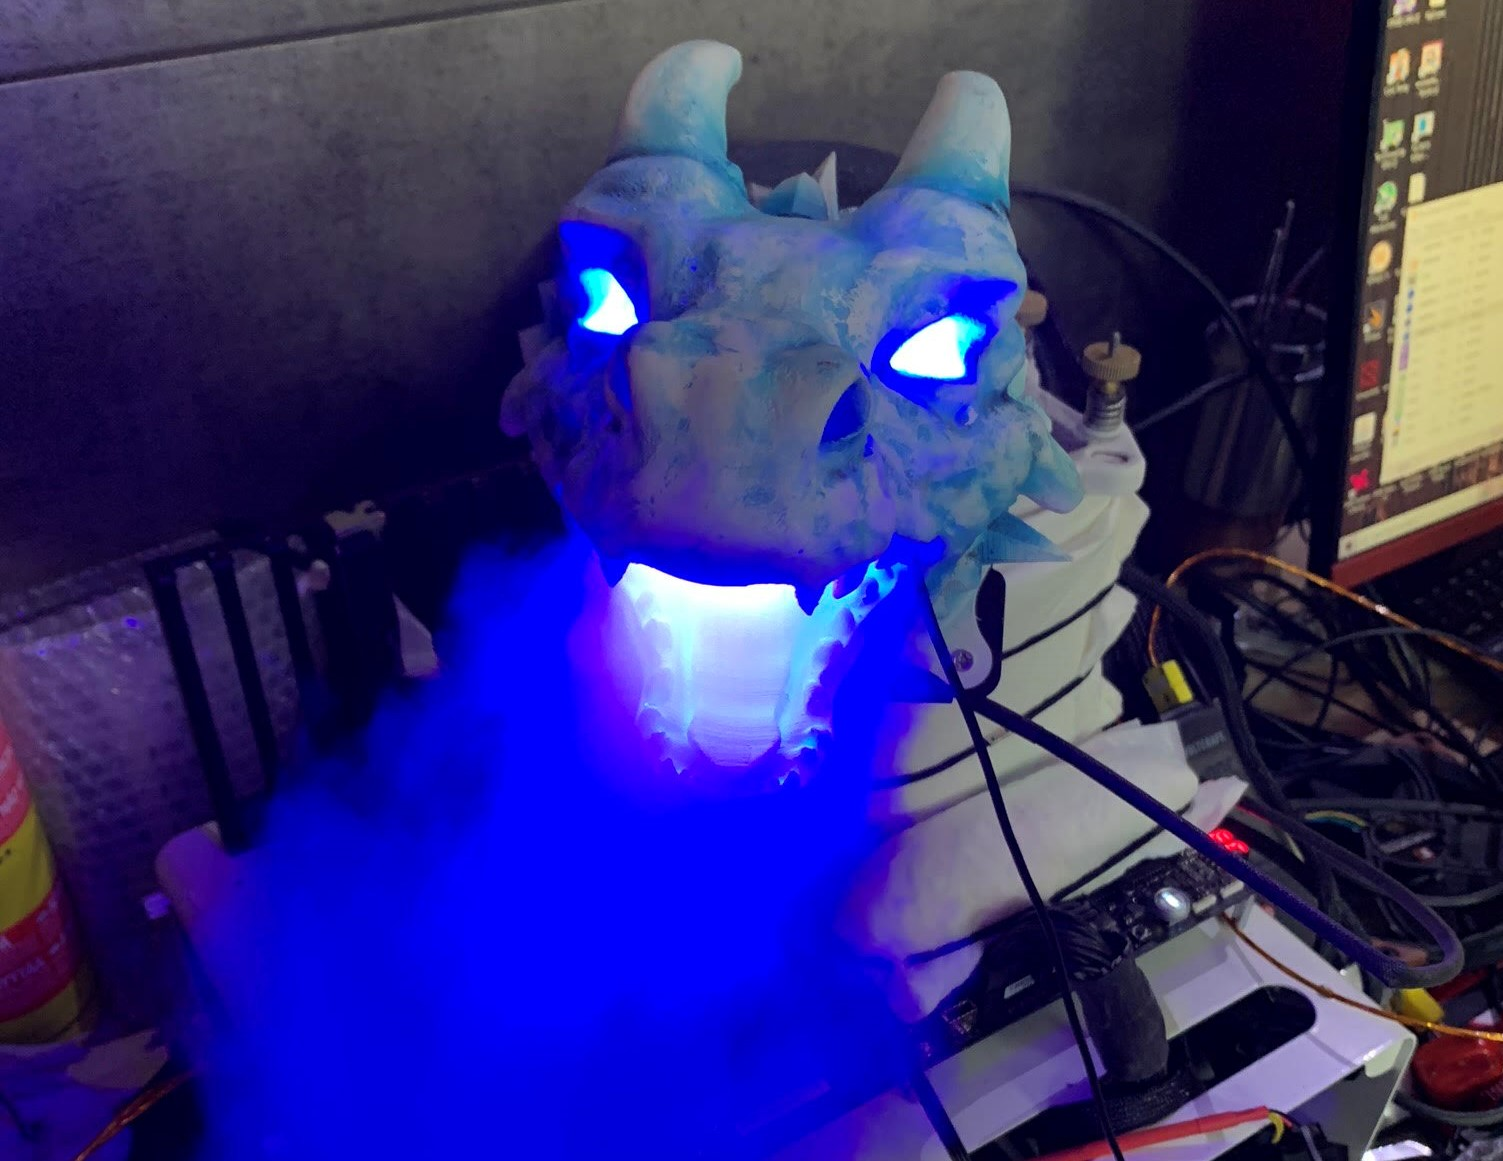 Overclocker Uses LN2-Breathing Dragon, AMD Ryzen to Challenge Records